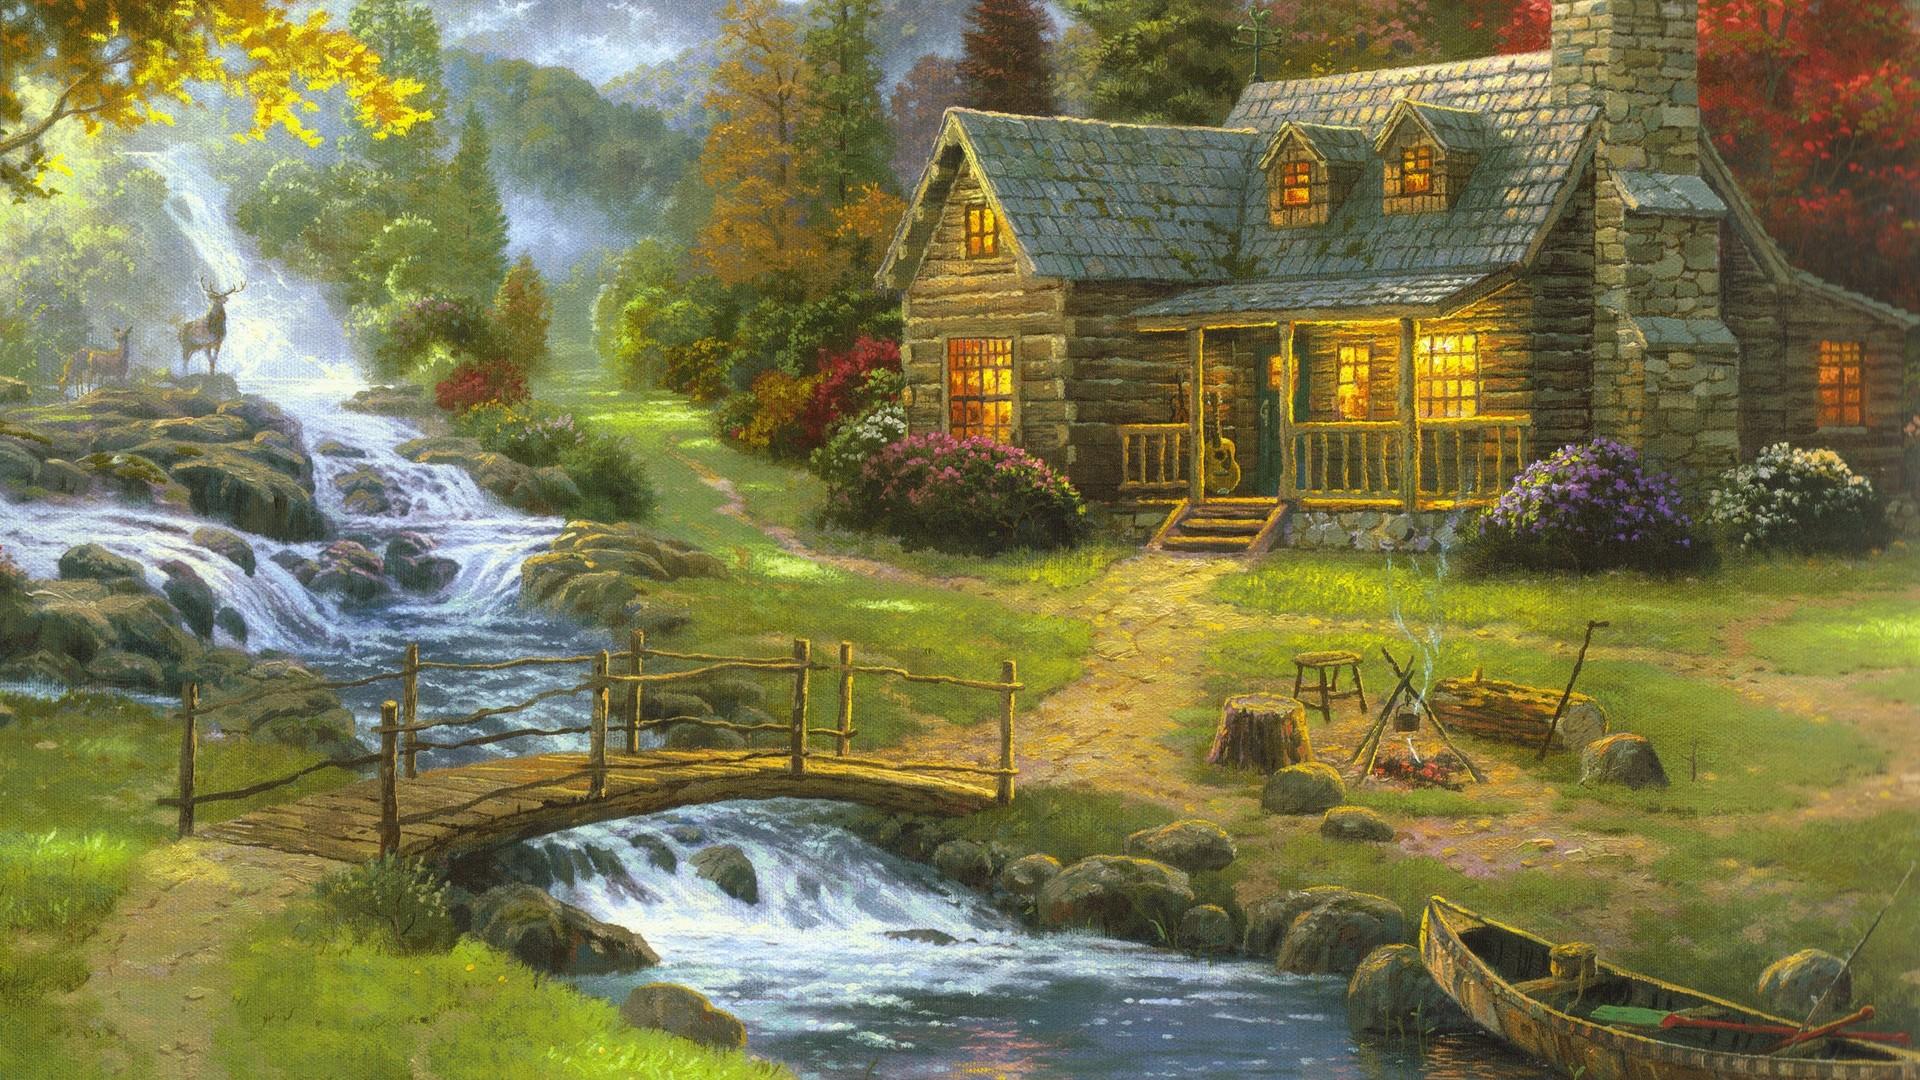 Painting Wallpaper theme